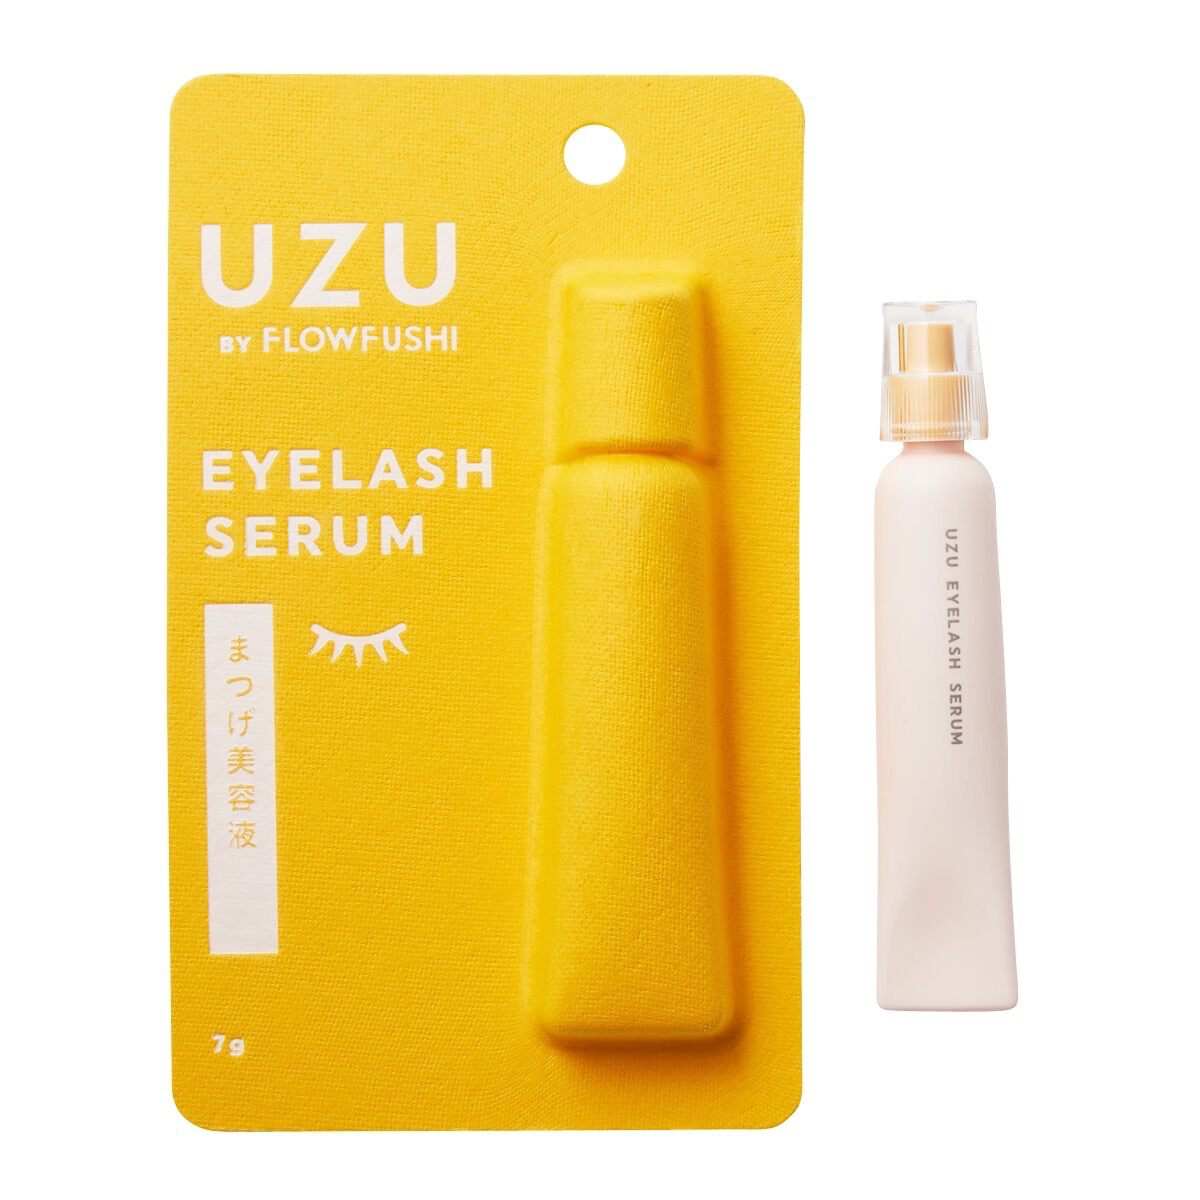 UZU BY FLOWFUSHI(ウズ バイ フローフシ)『まつげ美容液(まつげ・目もと美容液)』の使用感をレポに関する画像4